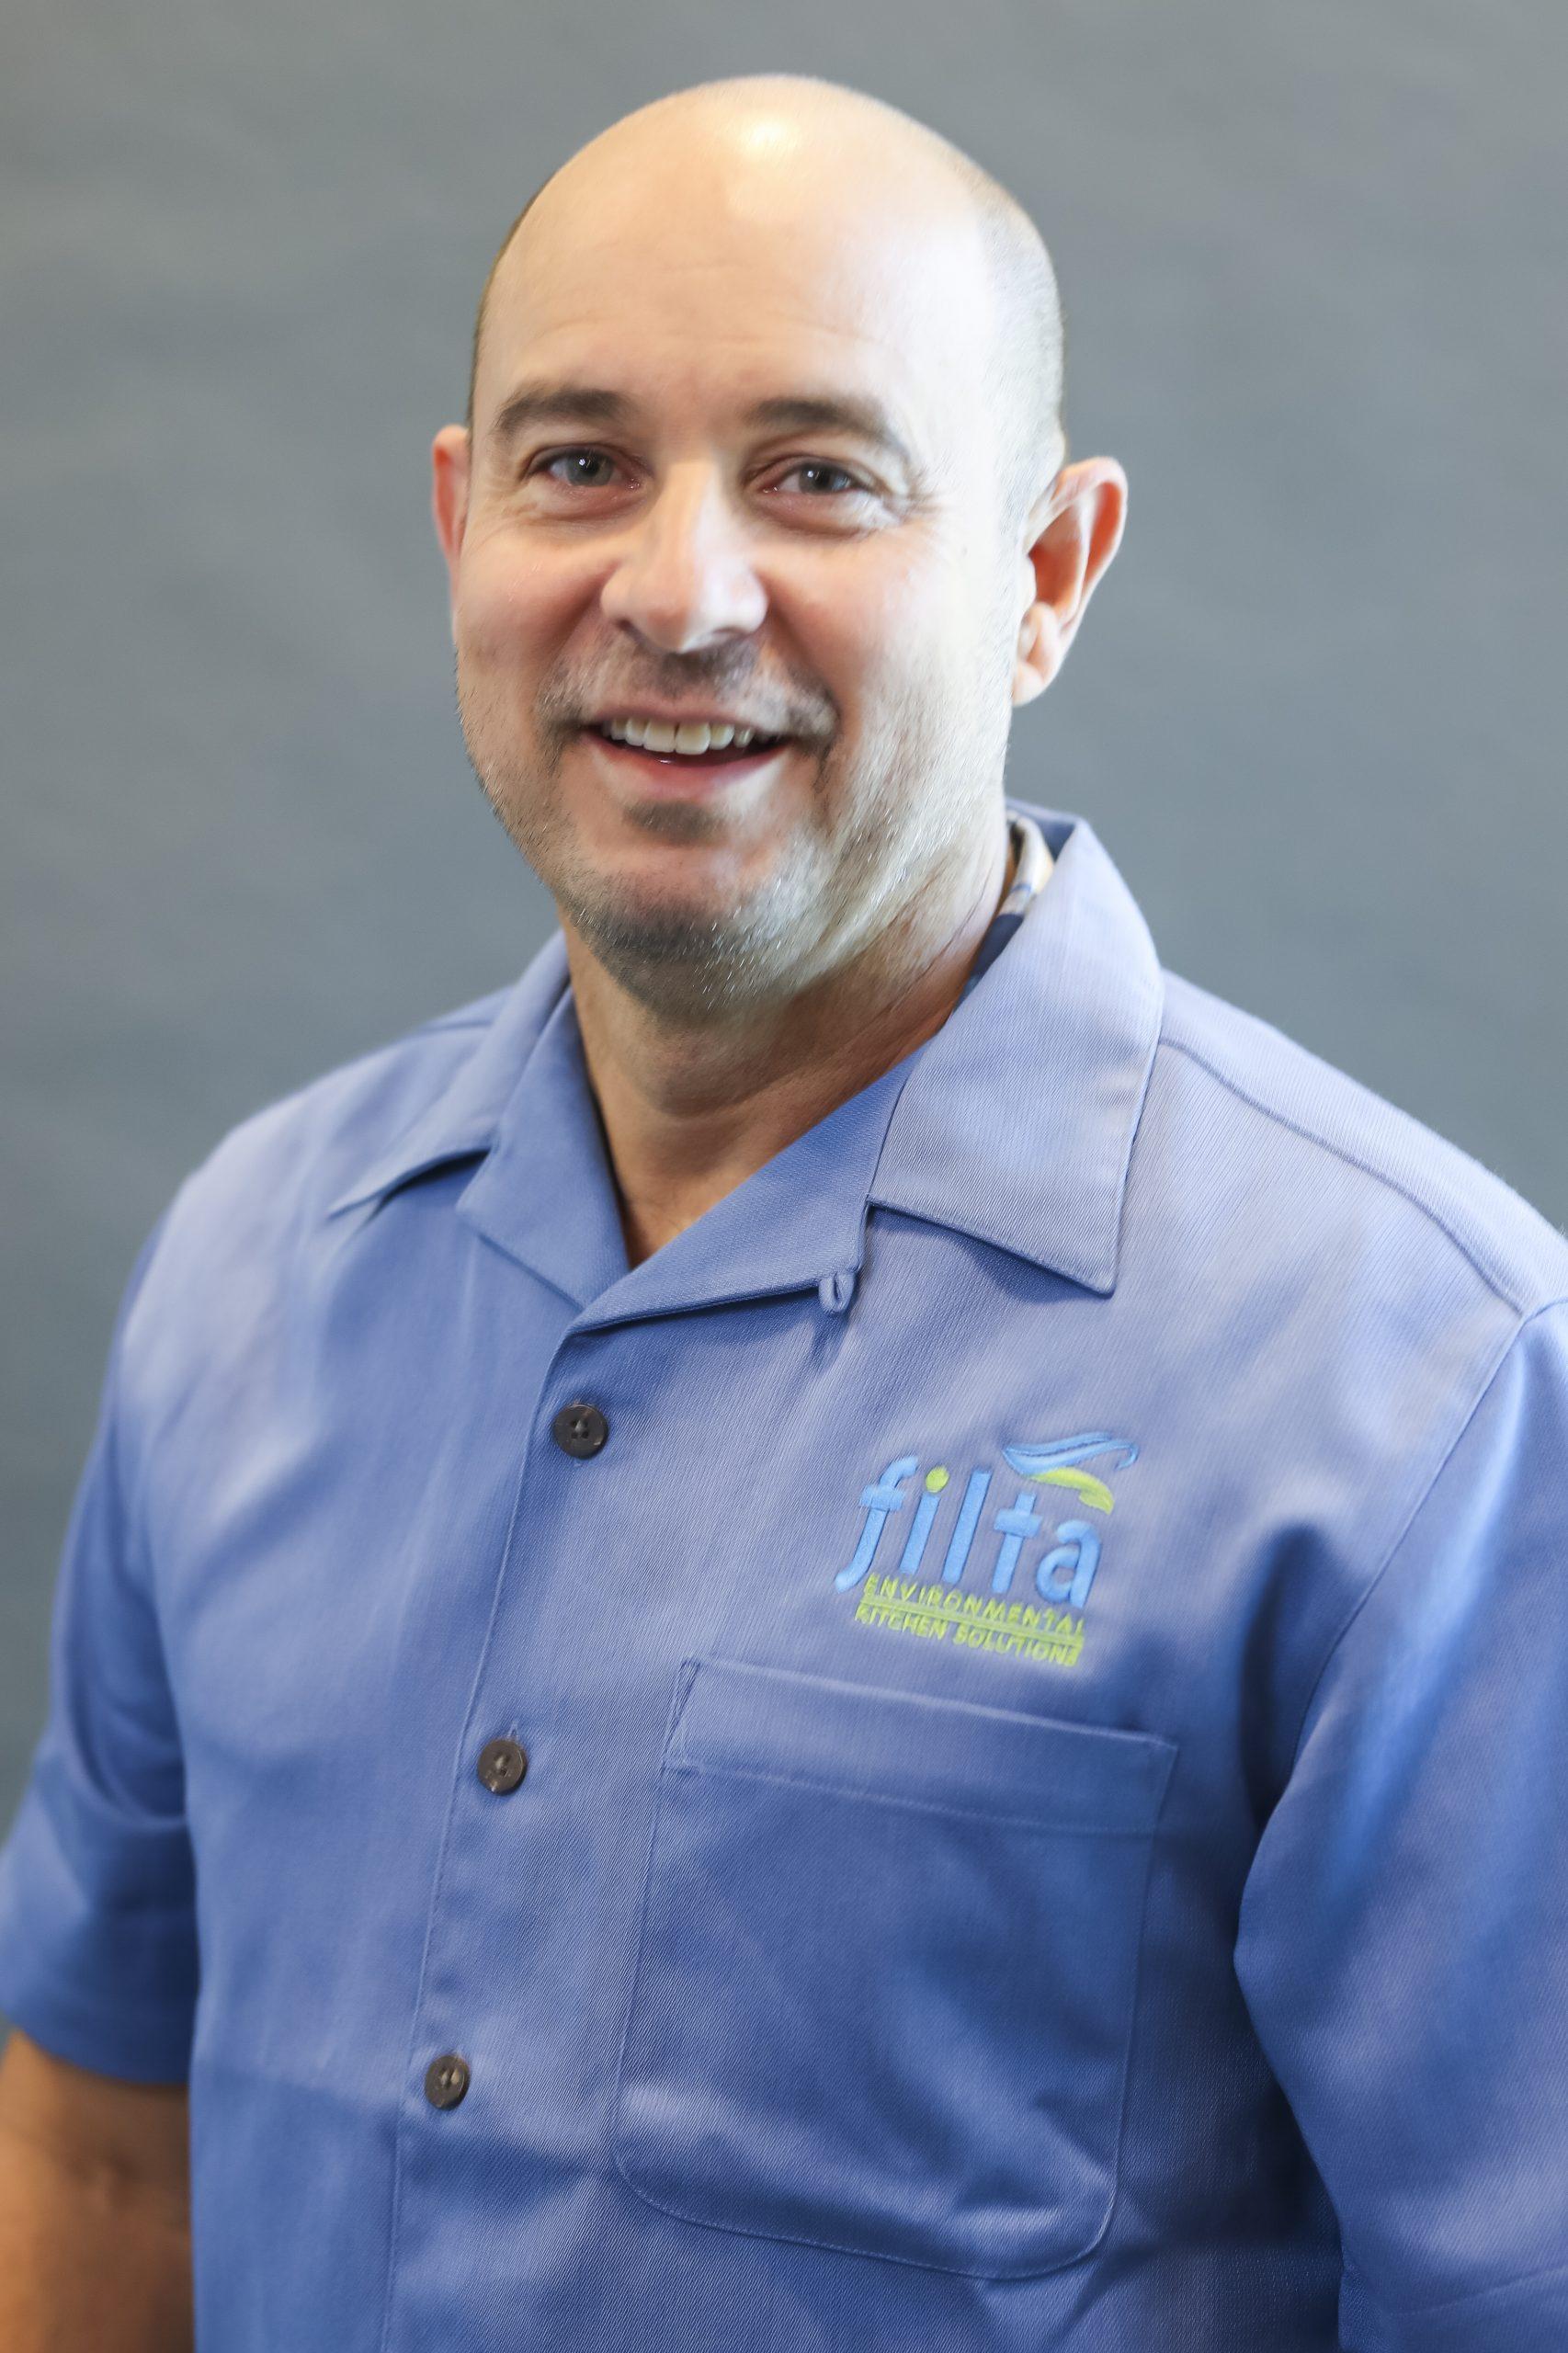 FIlta Franchise owner Trent Carlos